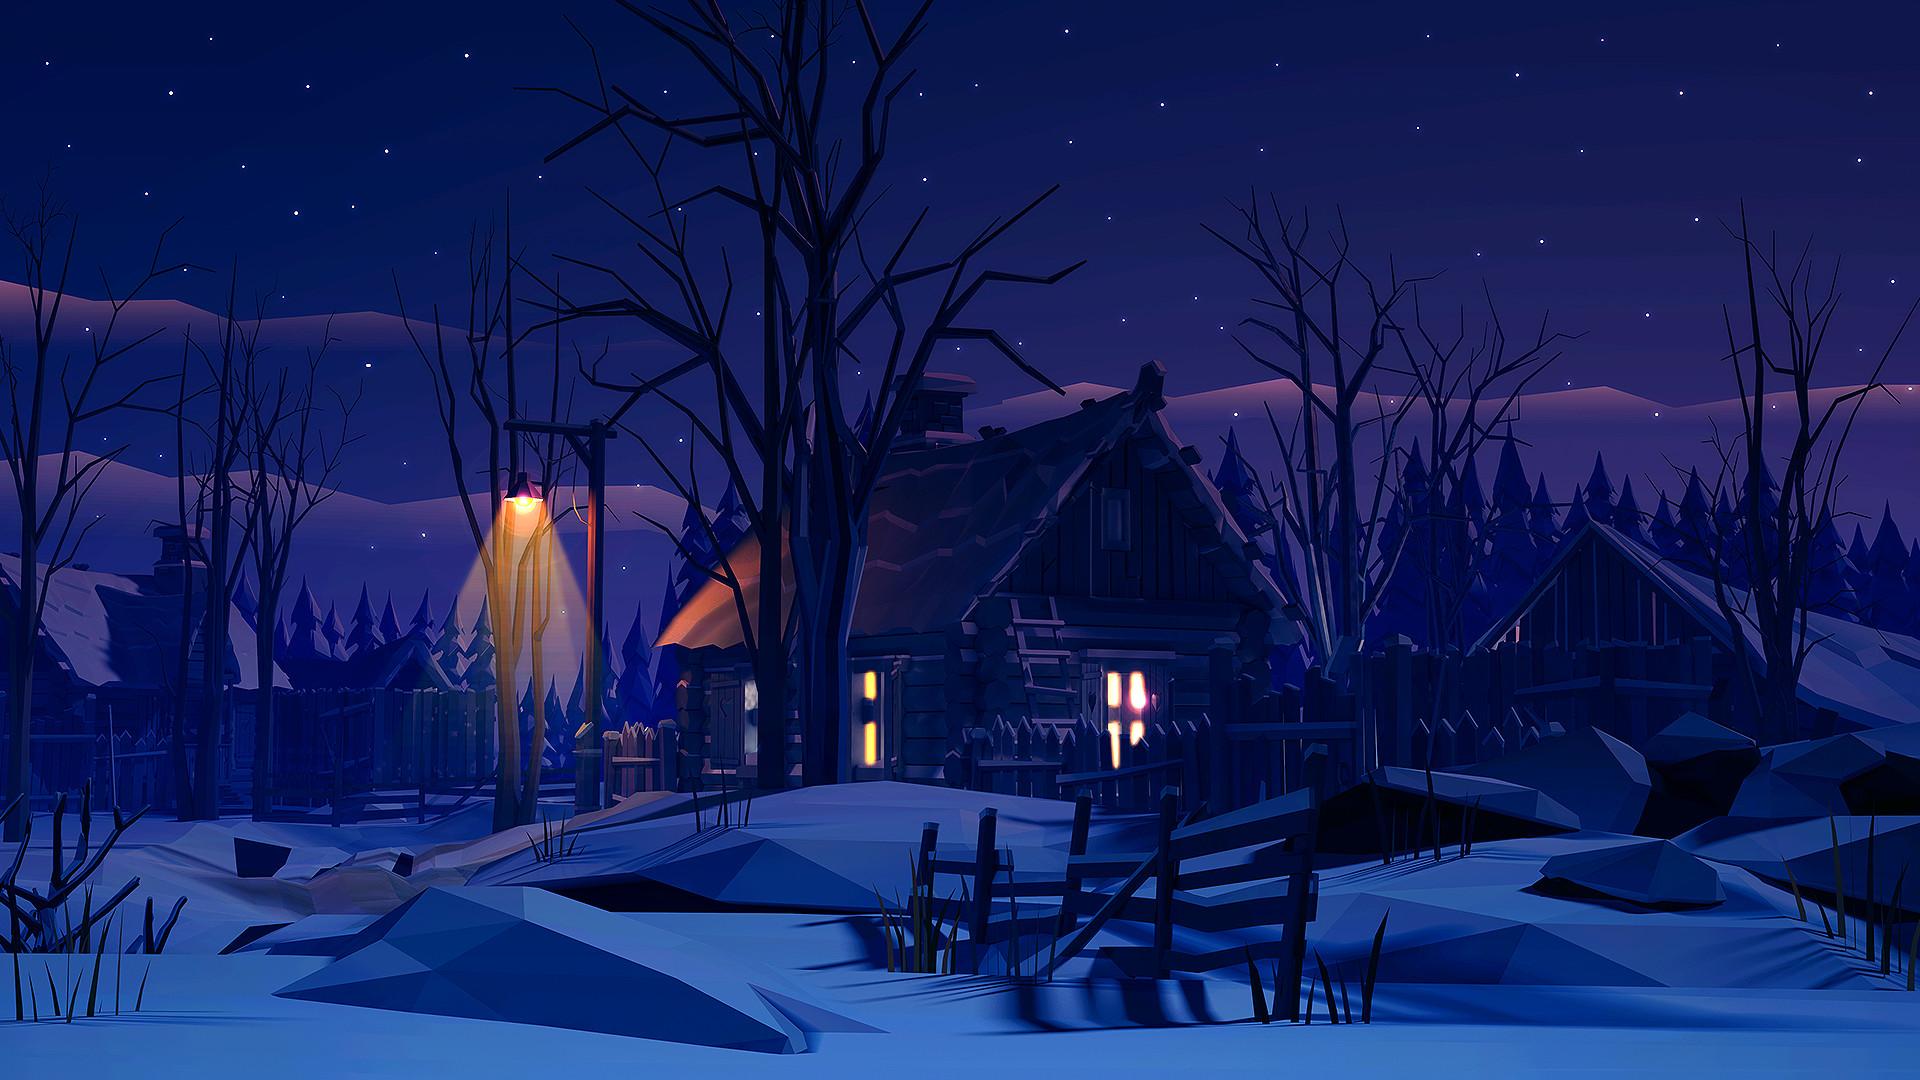 Winter night by prusakov Winter night by prusakov